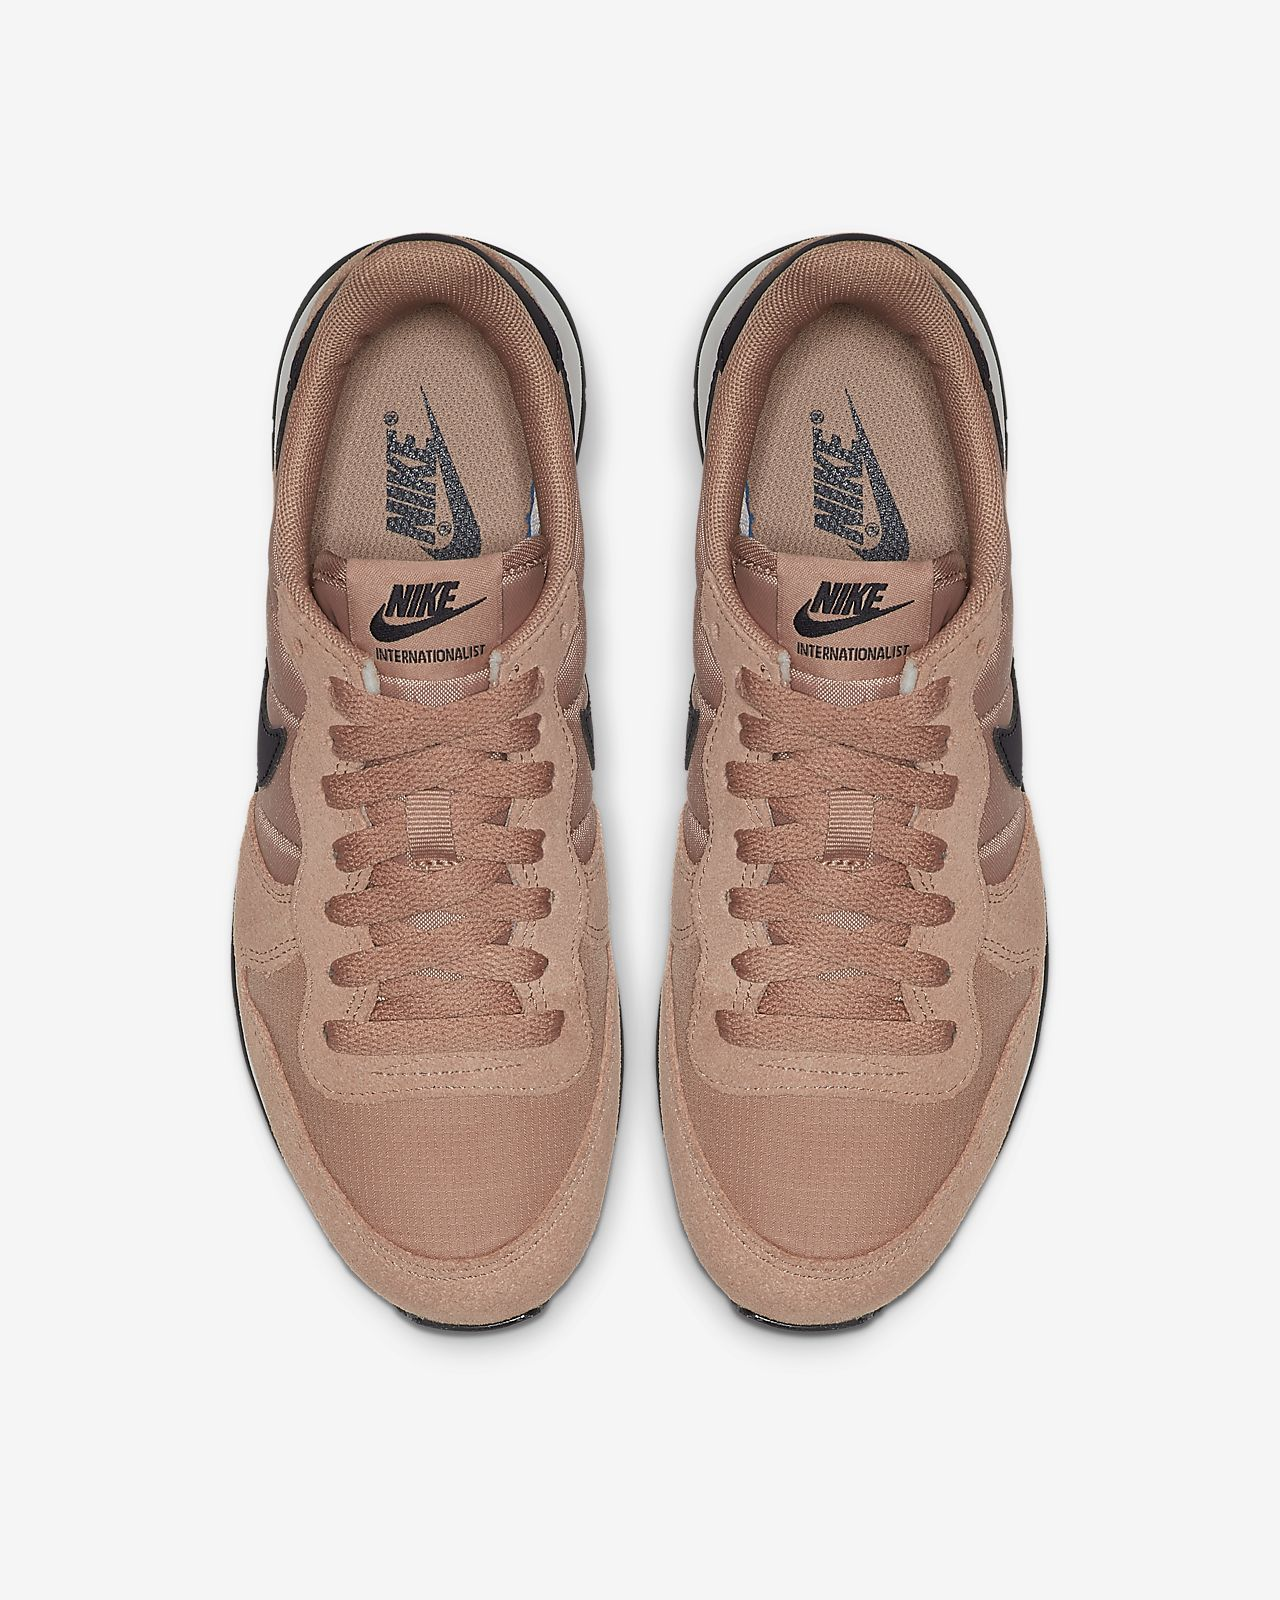 best website 3cd20 88ae9 Low Resolution Nike Internationalist Women s Shoe Nike Internationalist  Women s Shoe